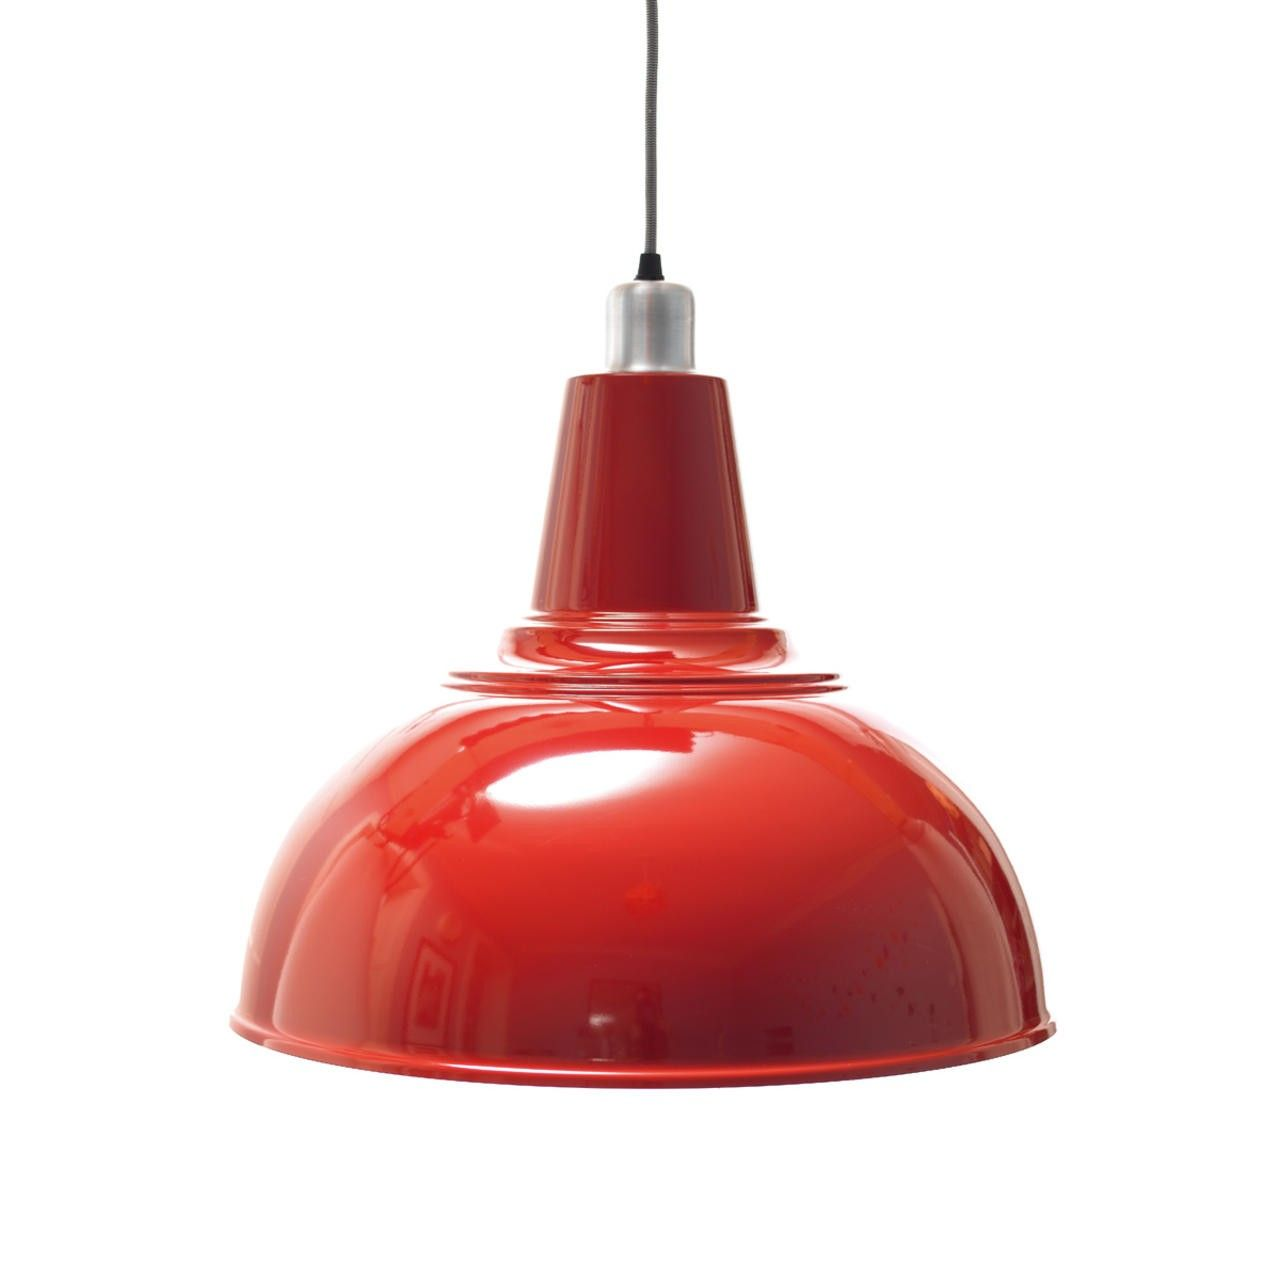 Welsh Lamps Red Kitchen Pendant Lights Kitchen Pendants Kitchen Lamps